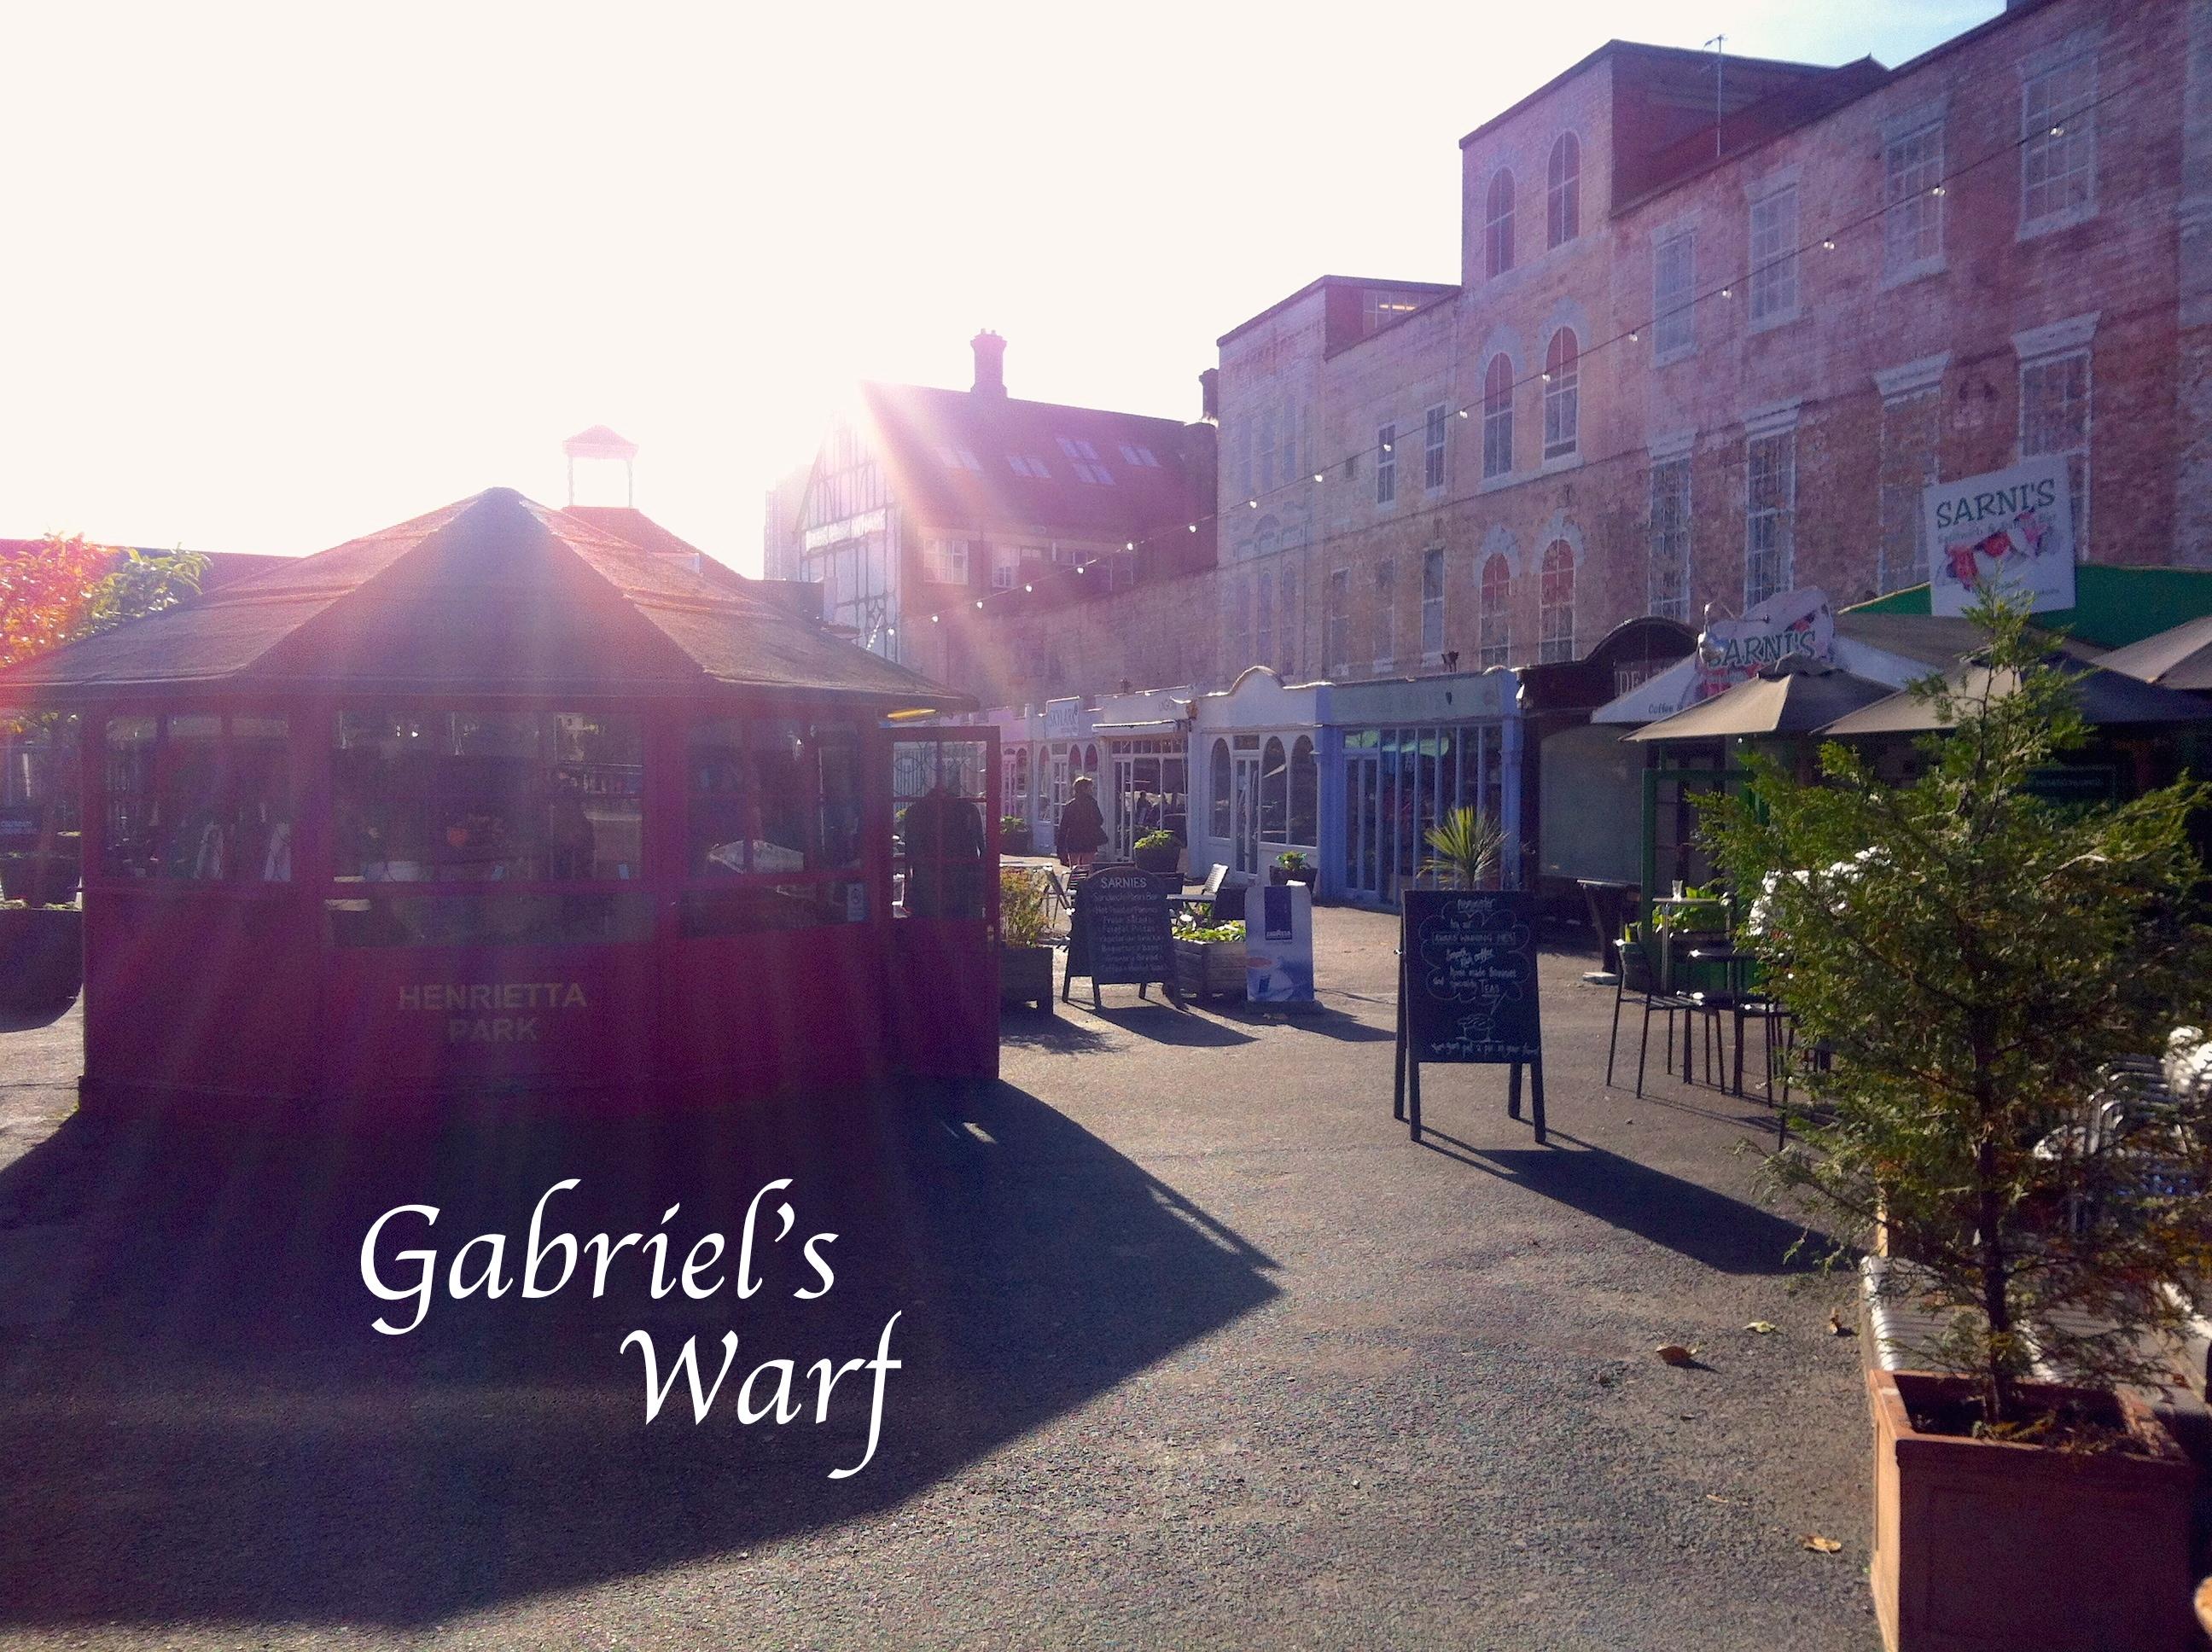 Gabriel's Warf